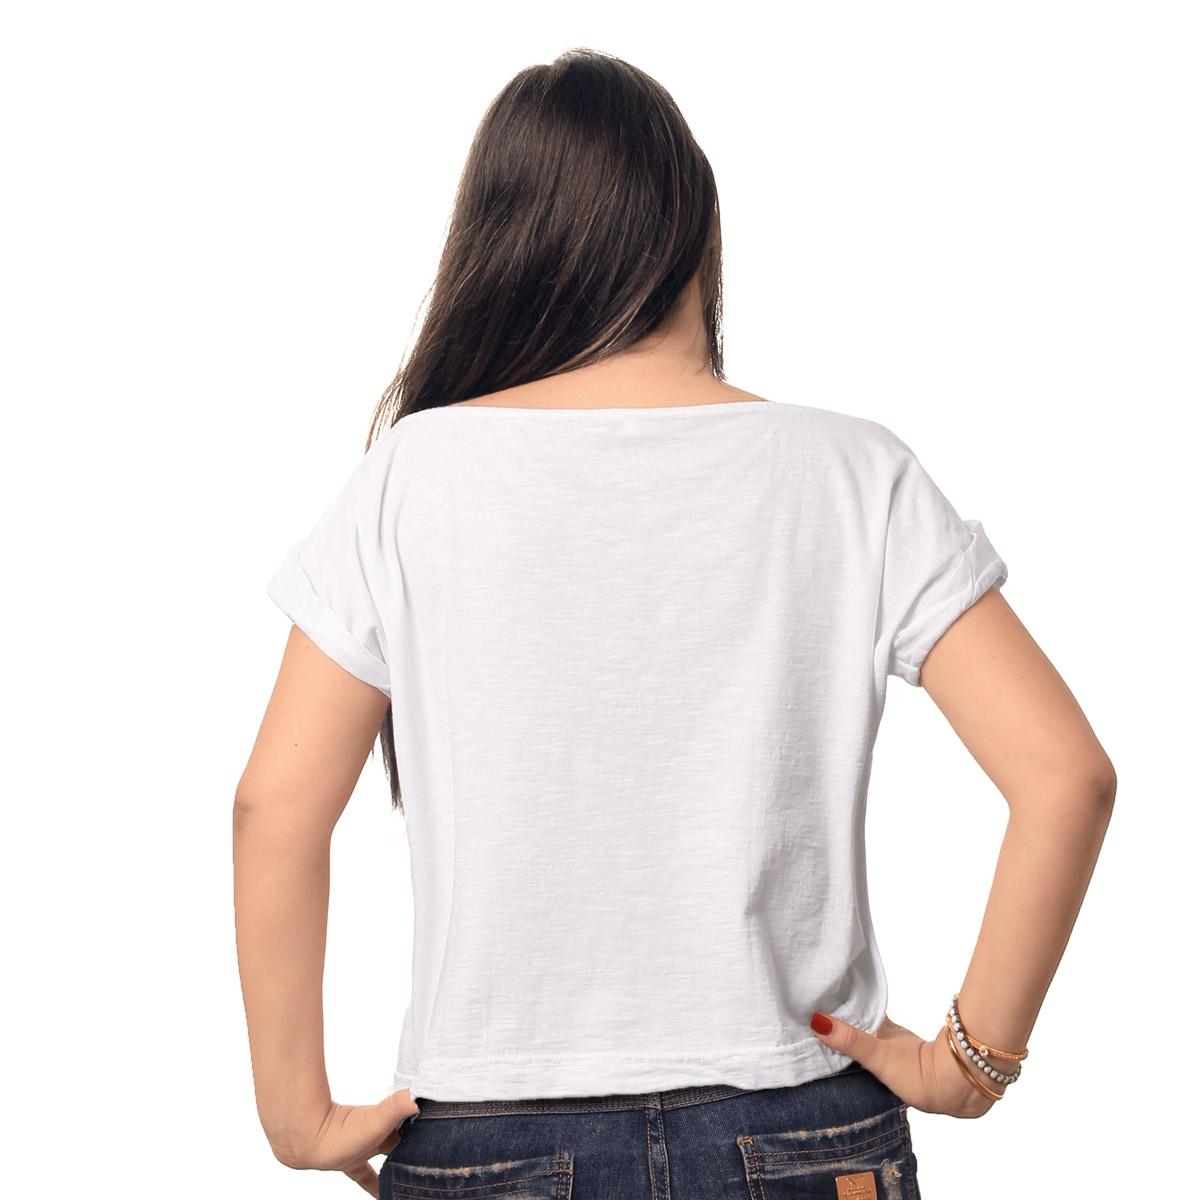 T-shirt Premium Gola Canoa Ivete Sangalo Riso